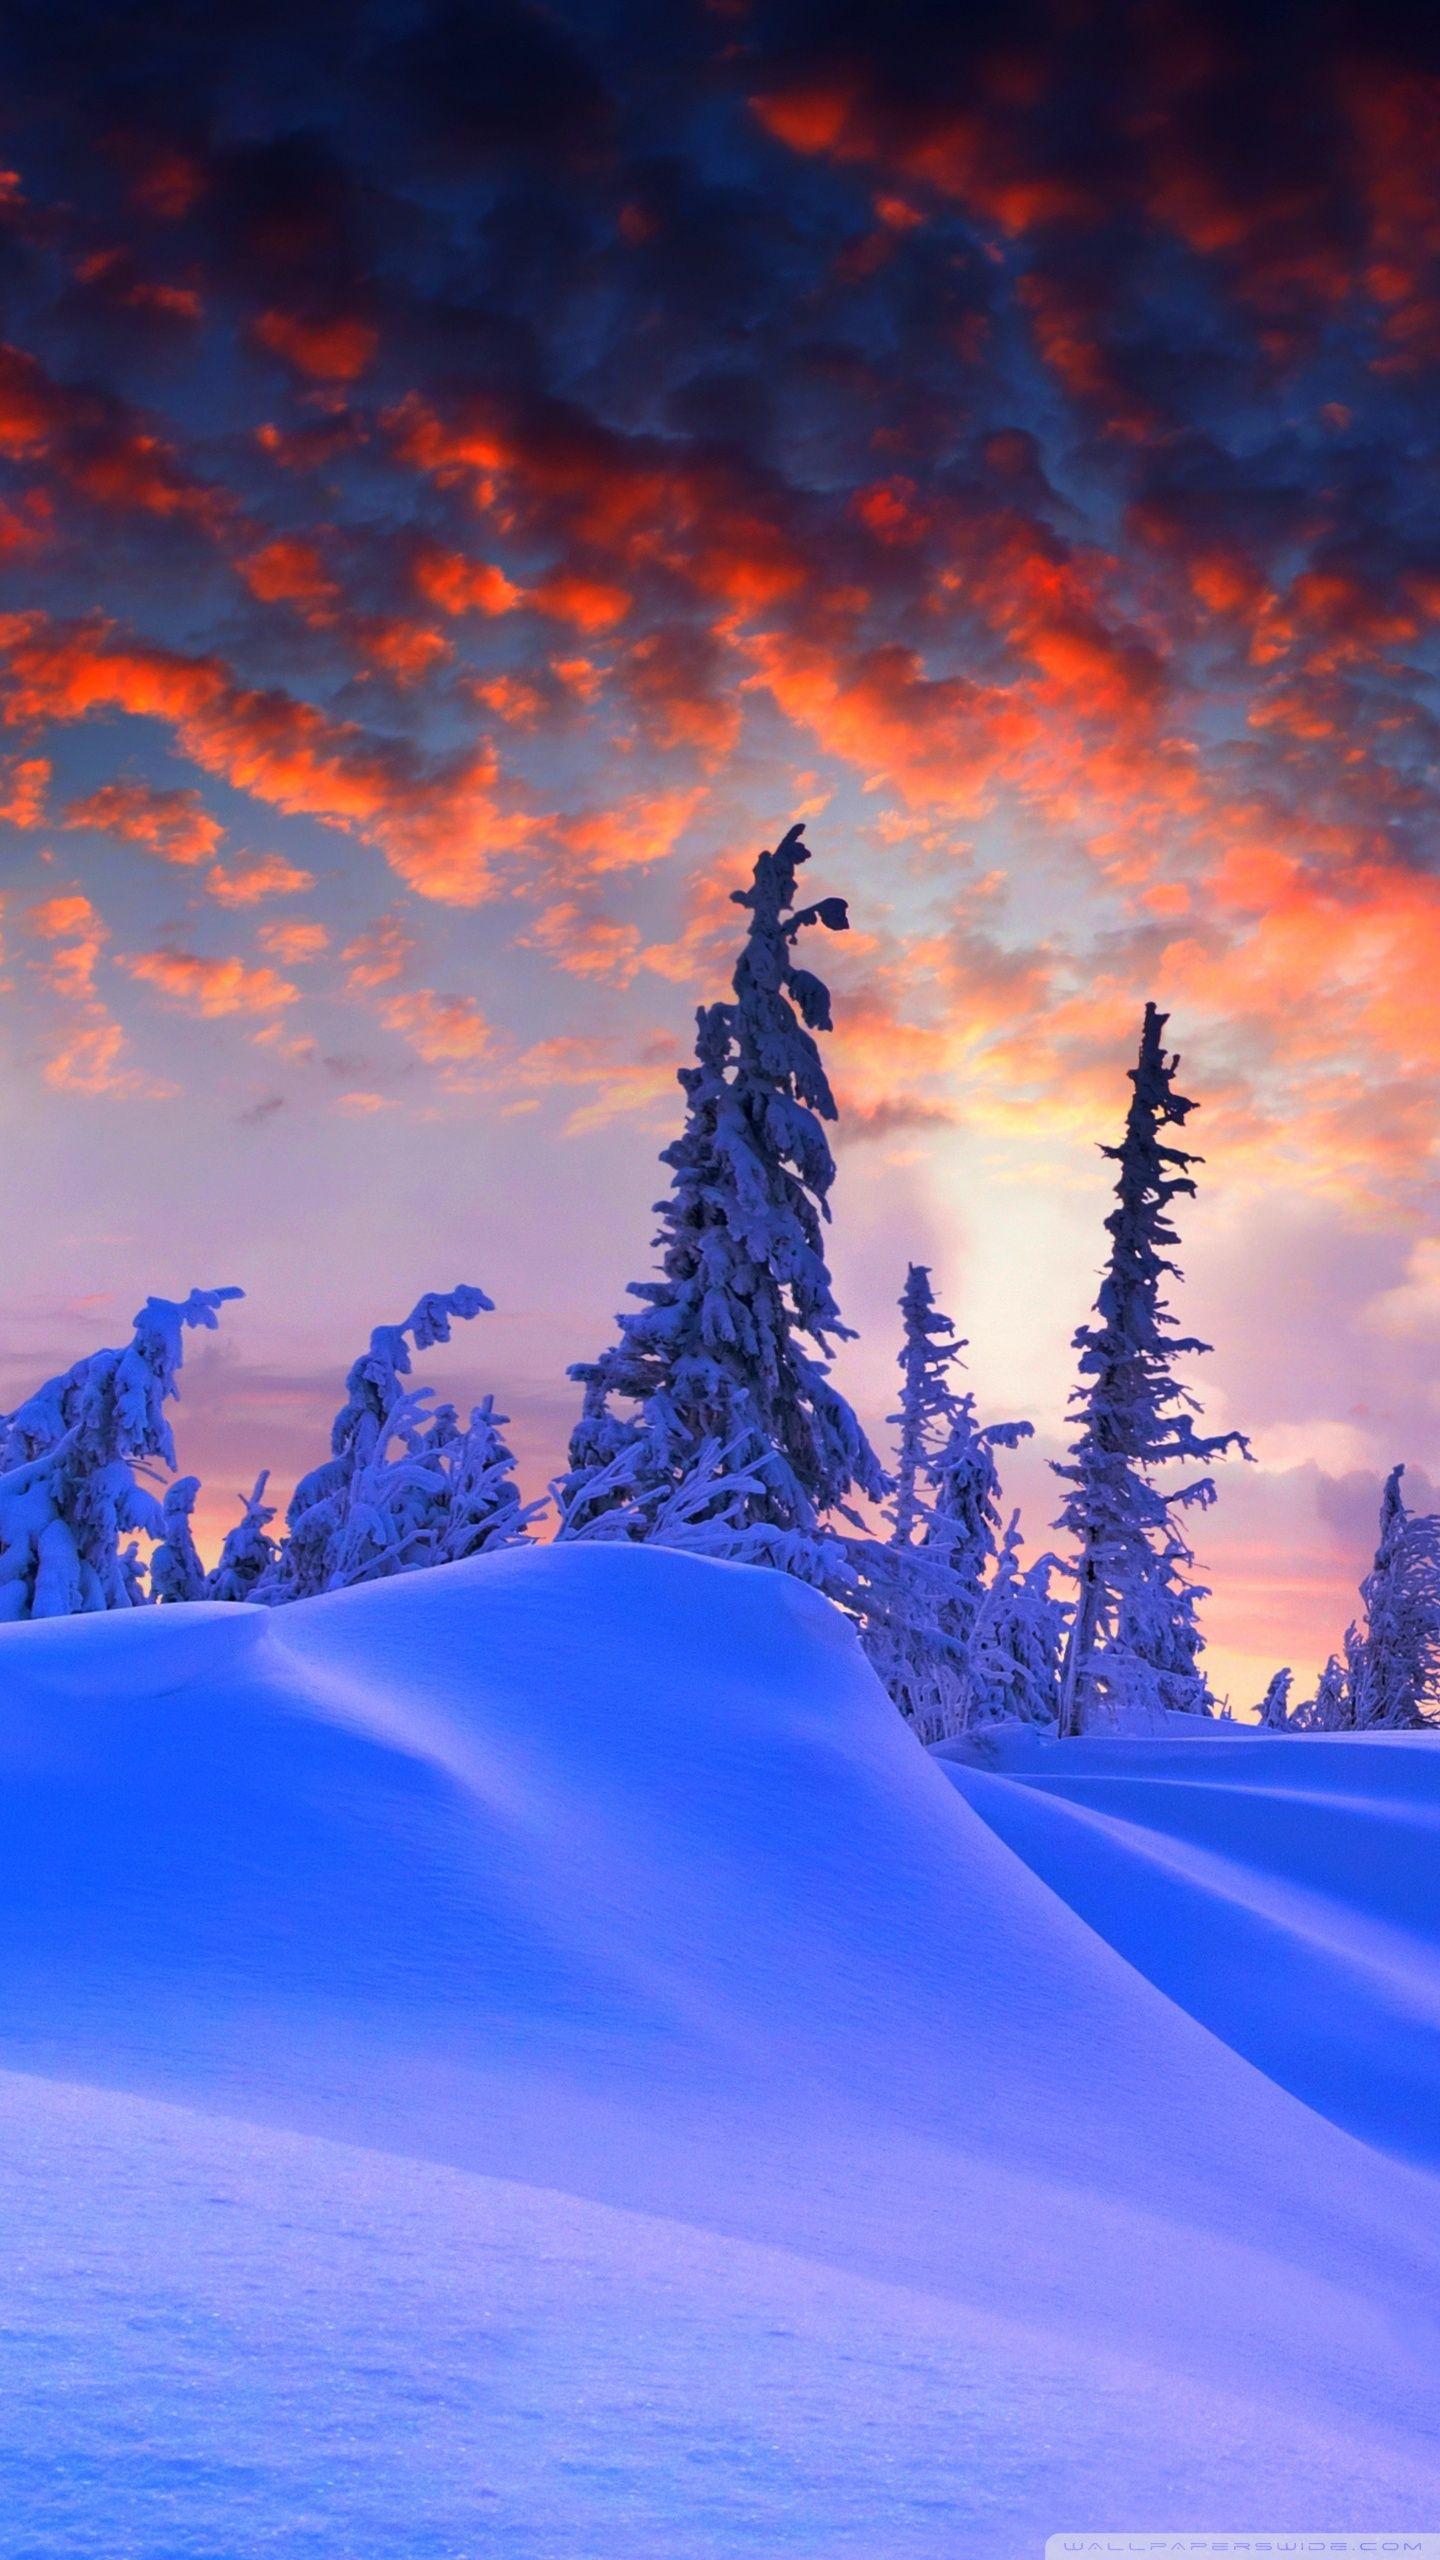 Full HD 1440x2560 Wallpapers Img 12 Природа, Облака, Обои